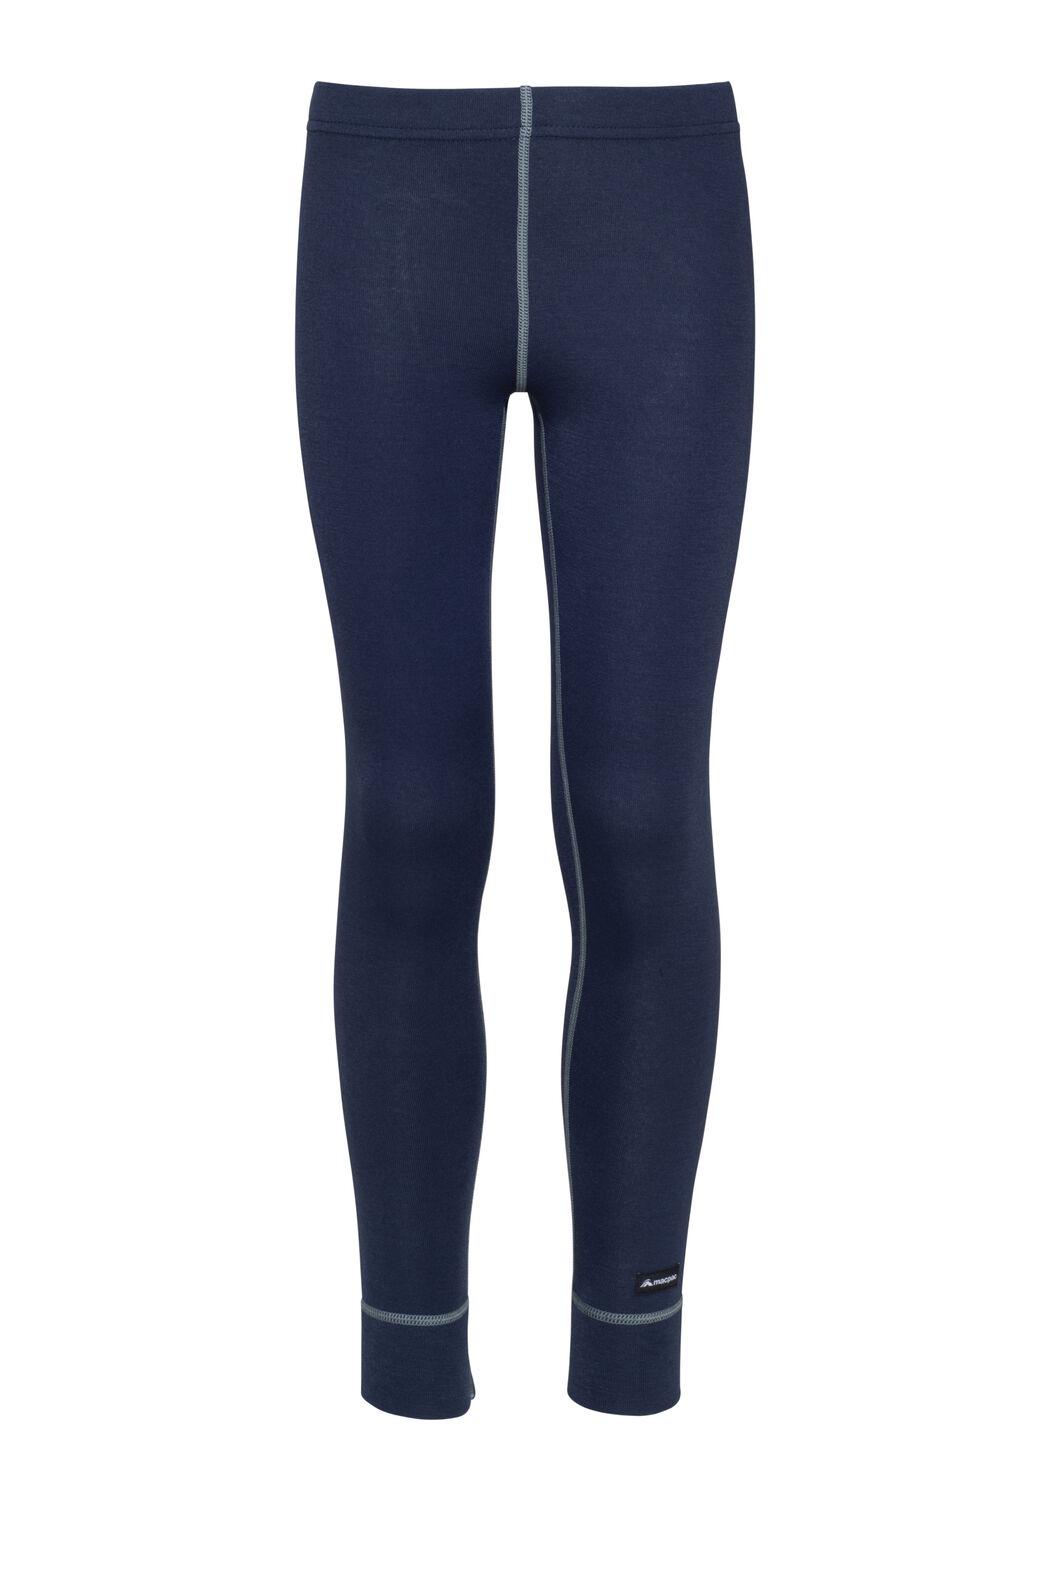 Macpac Geothermal Pants — Kids', Black Iris, hi-res